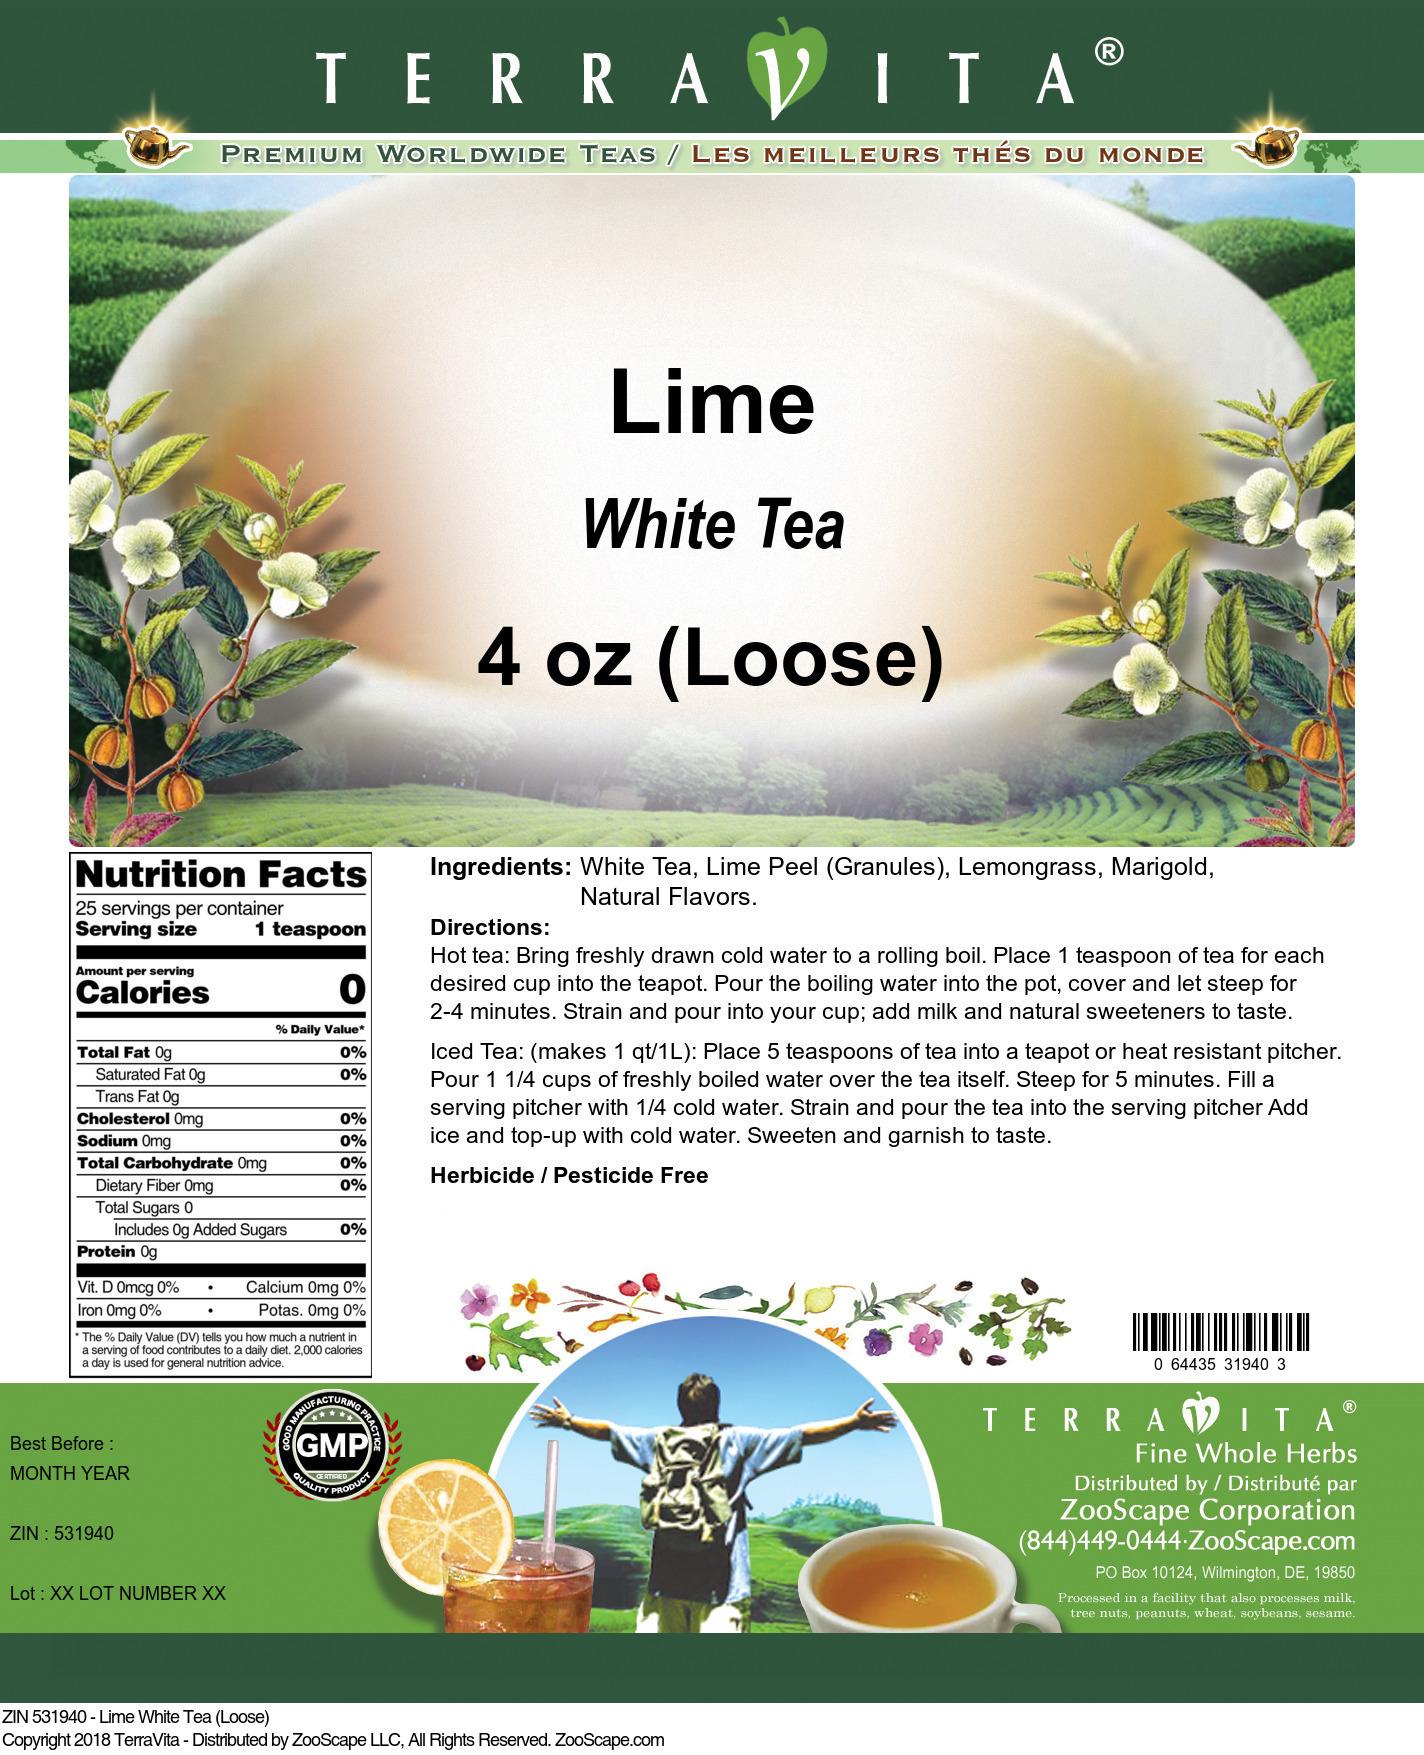 Lime White Tea (Loose)